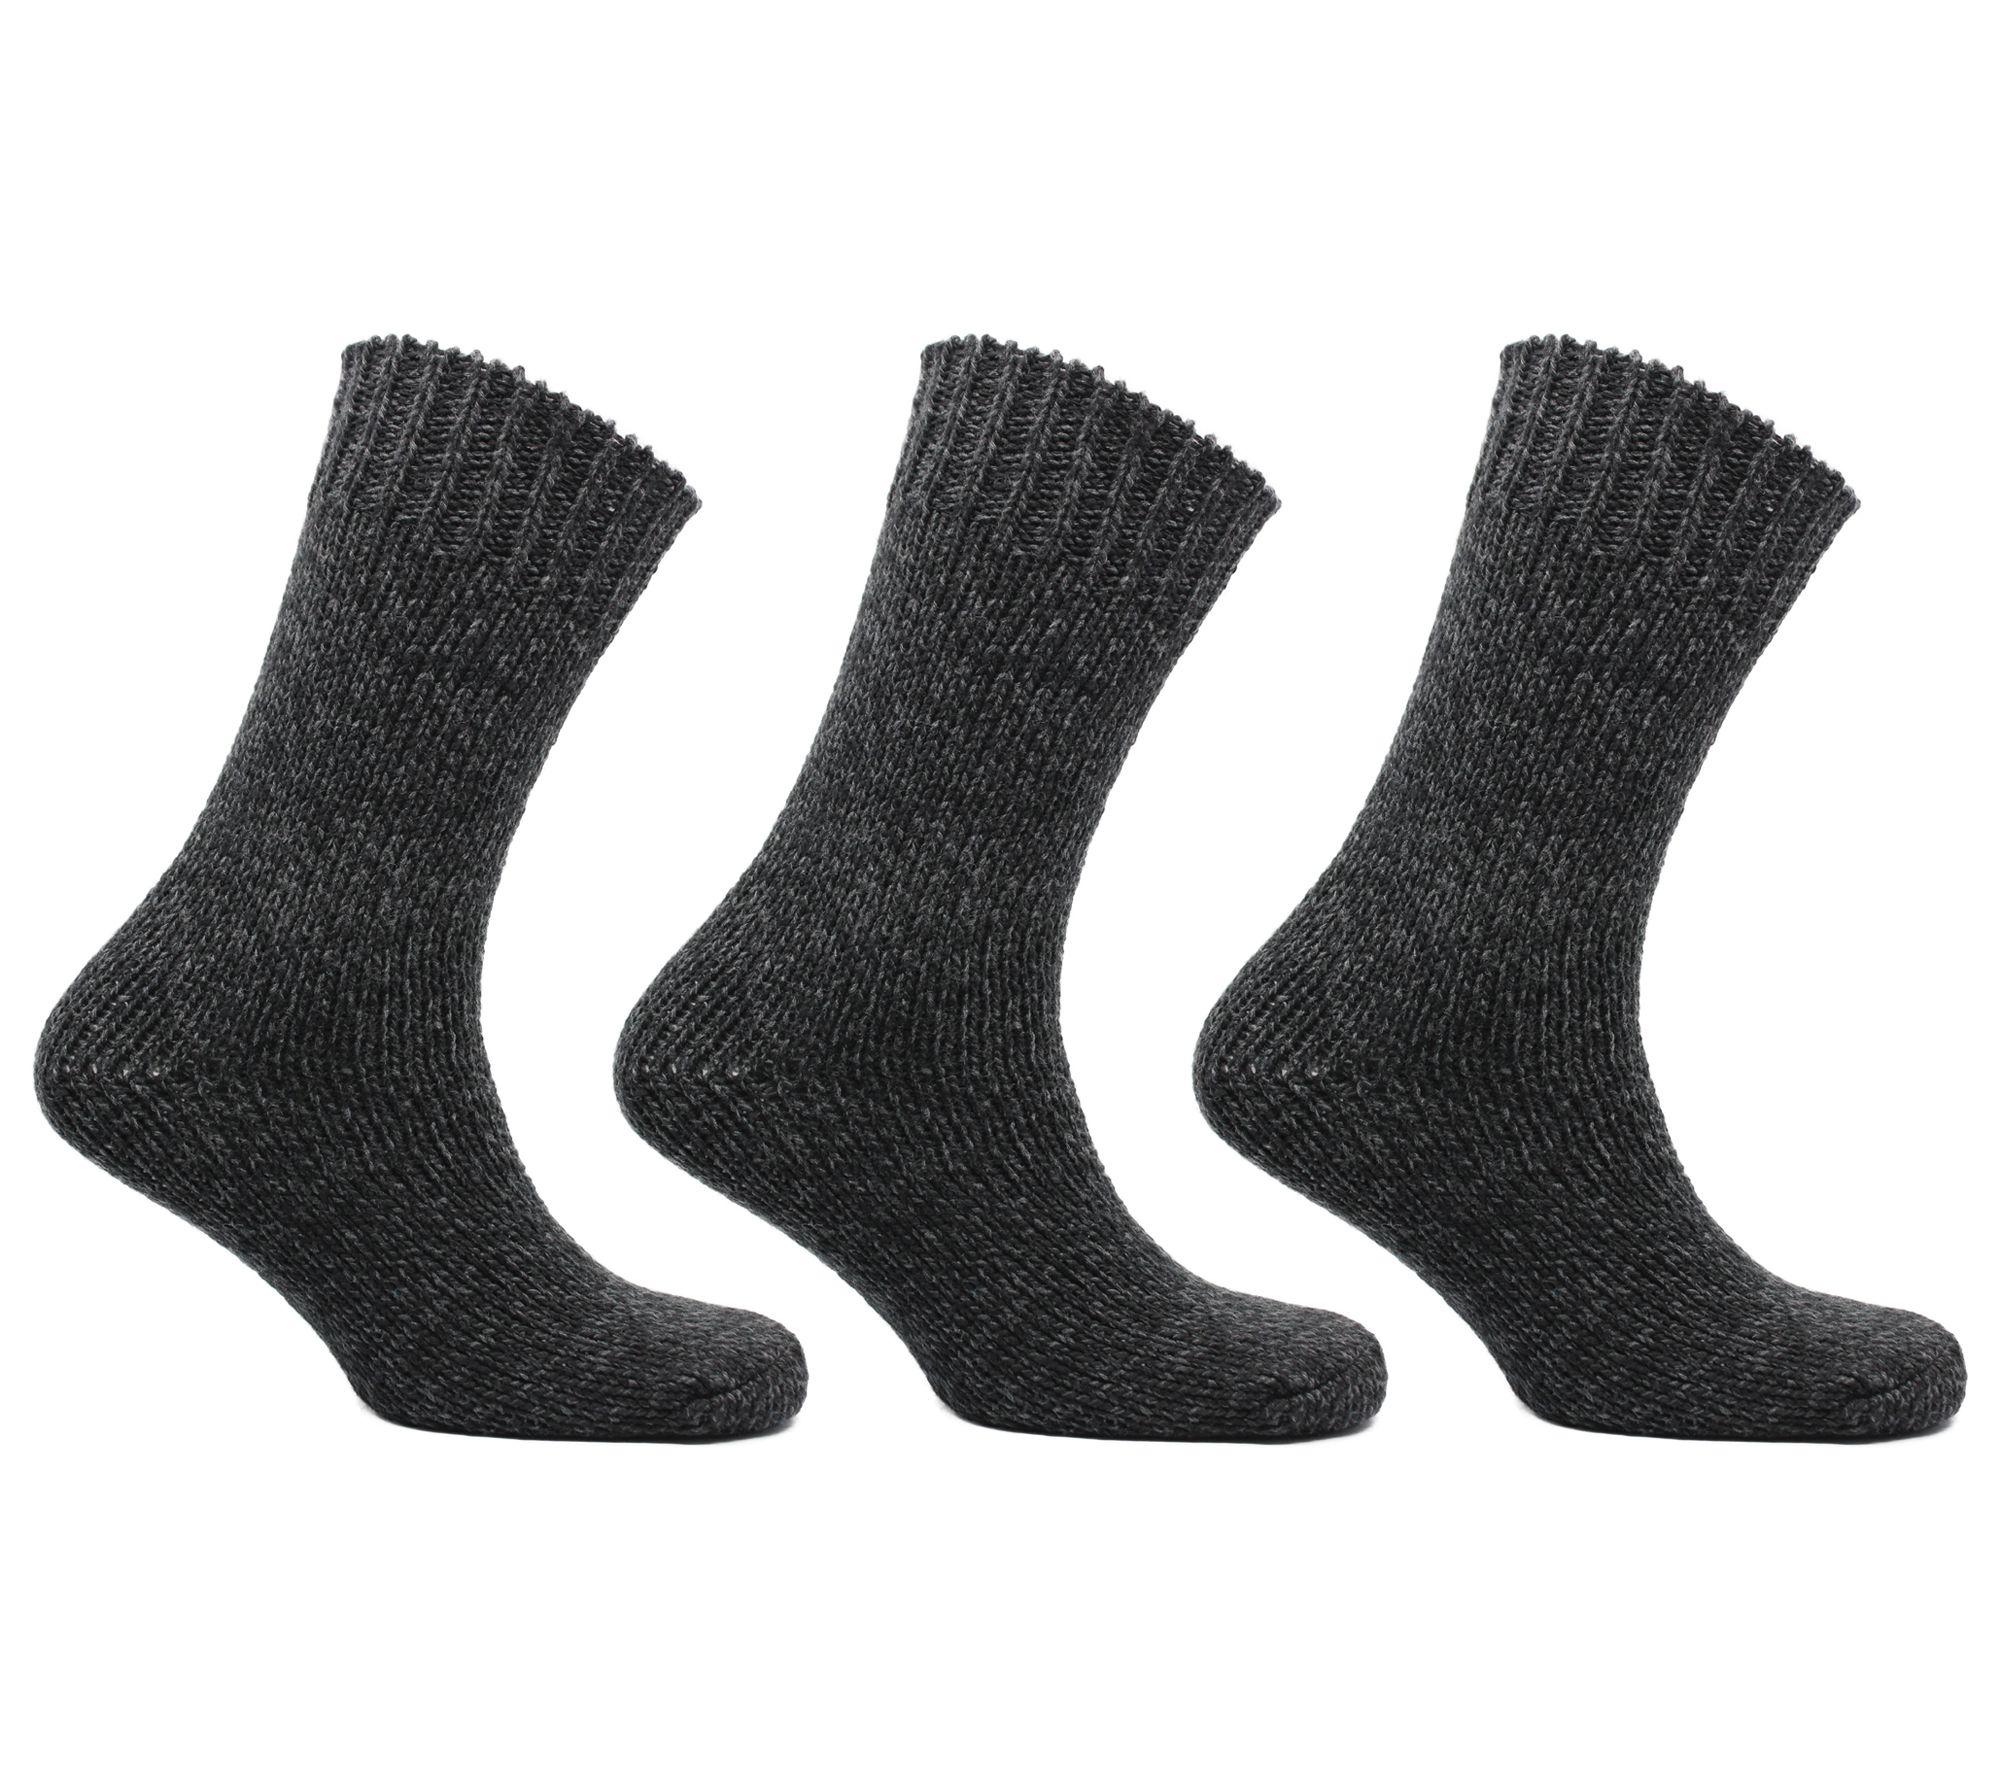 Norfolk Set of 3 Ragg Socks - Raggsocks